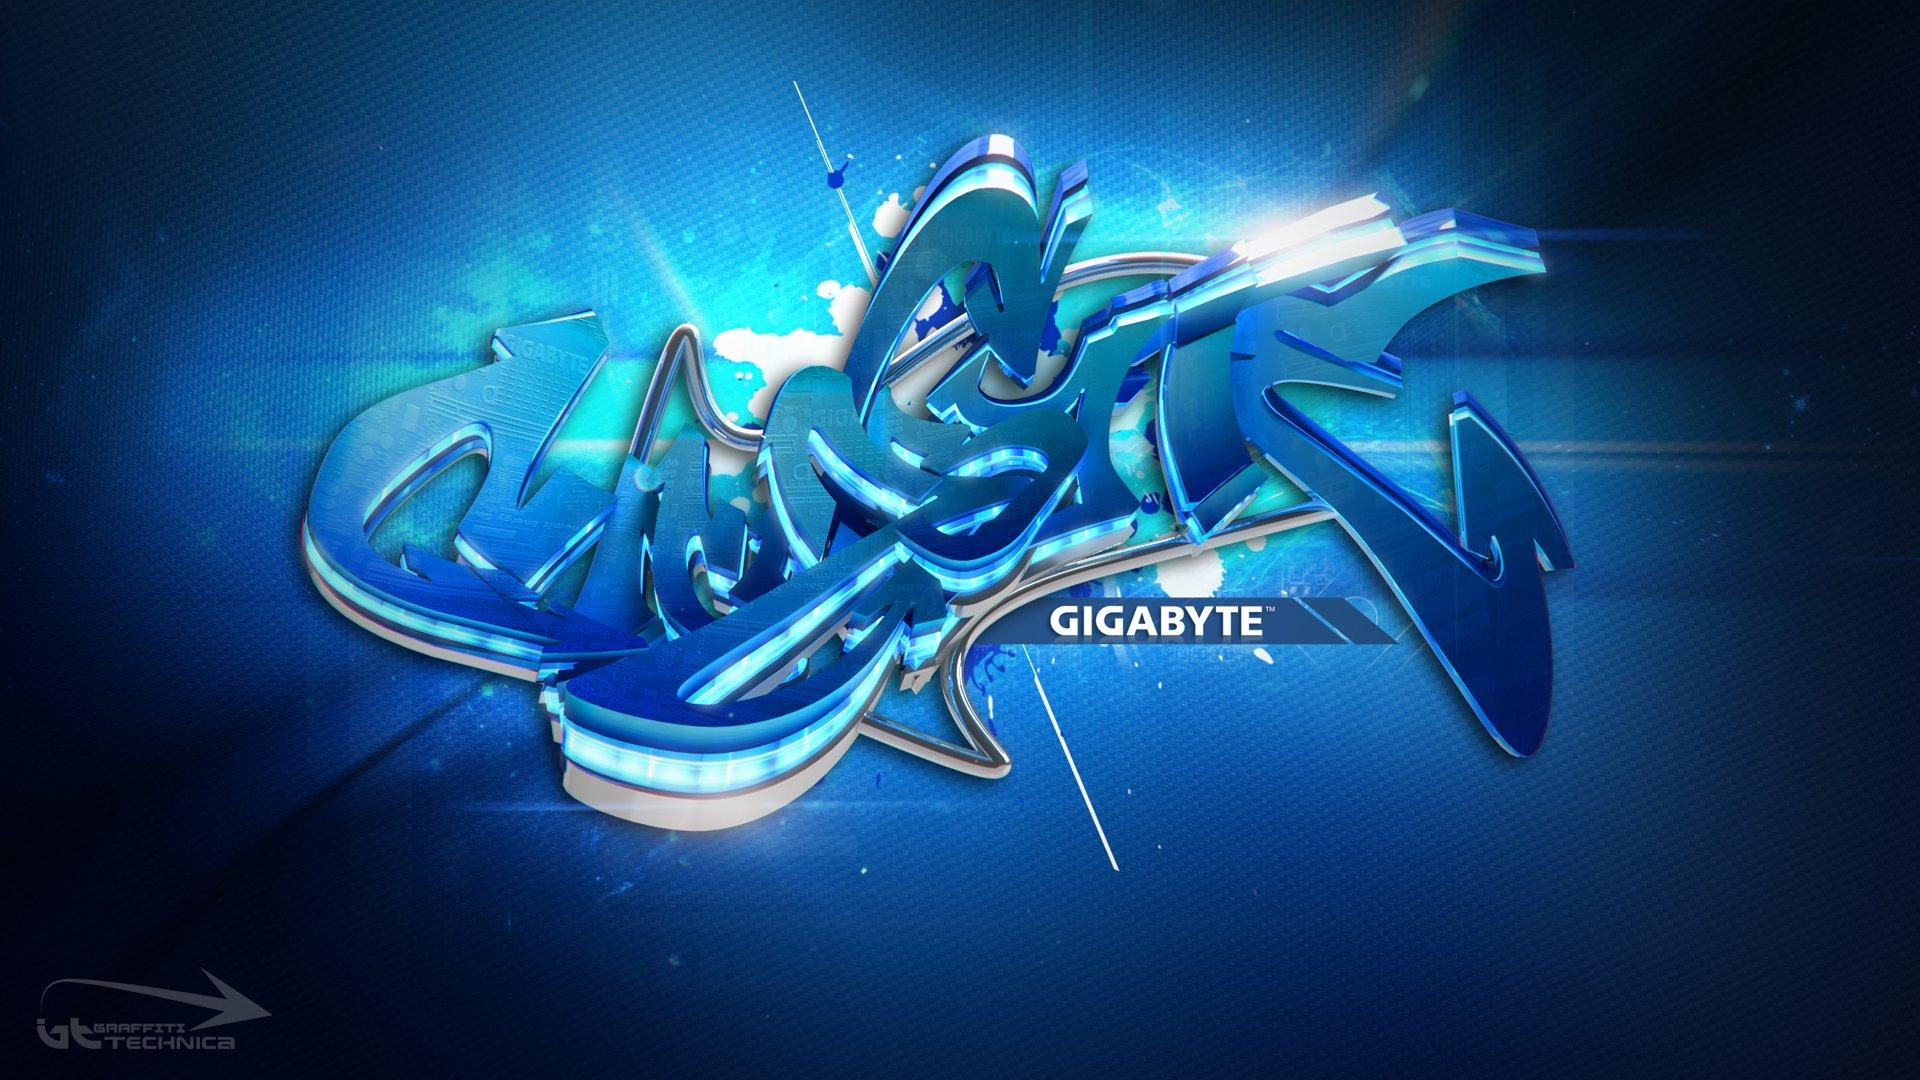 Razer Blue Graffiti Pics, Products Collection